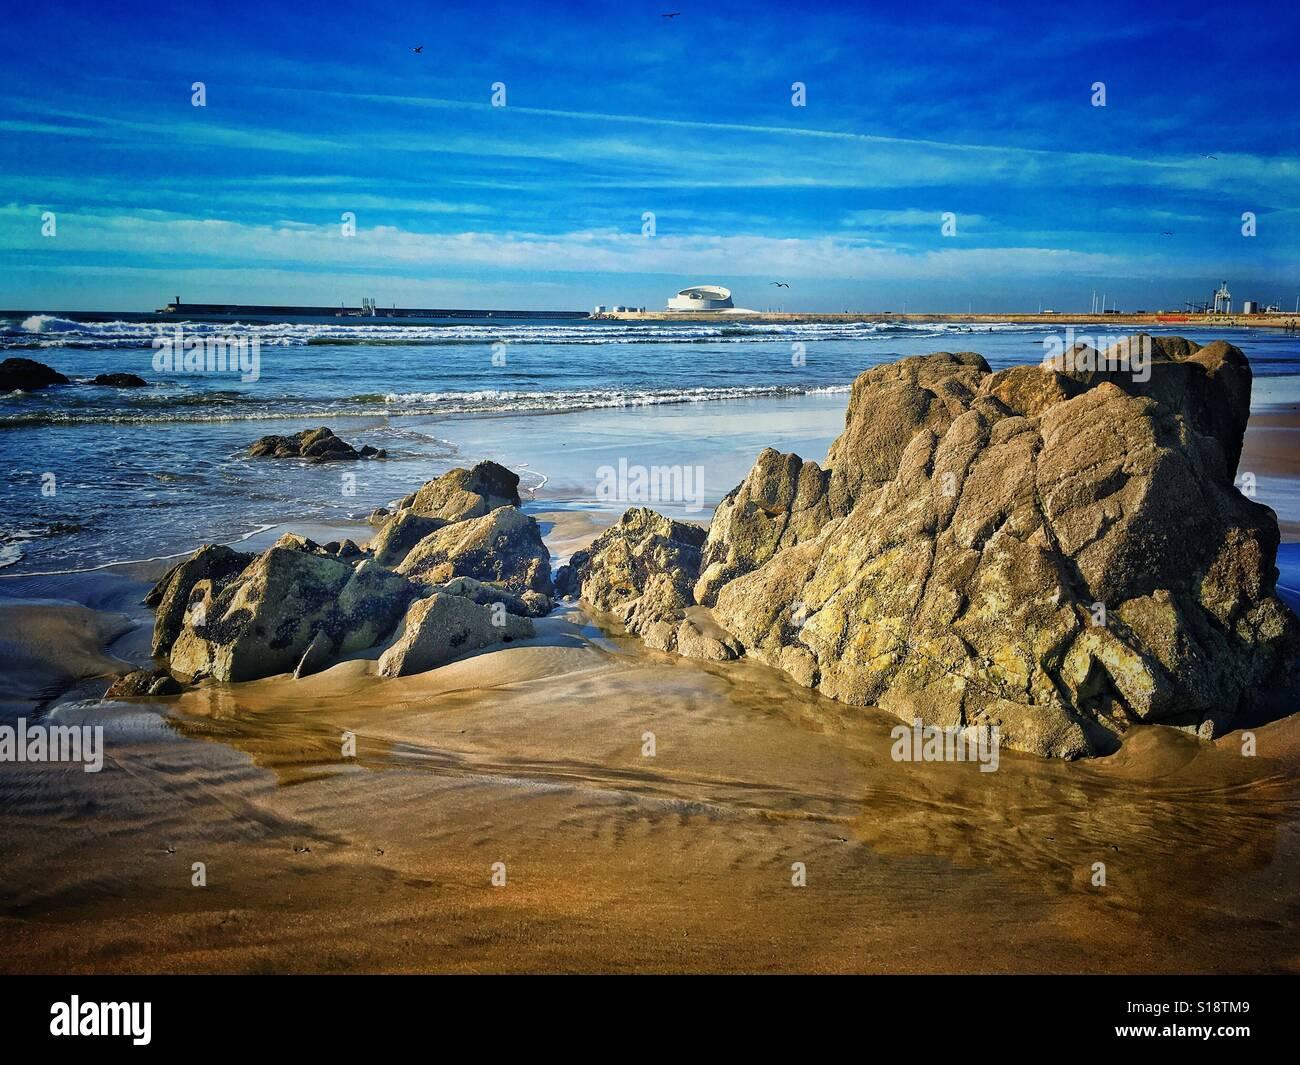 Rocks on Atlantic Ocean beach. Cruise Terminal building on background. Stock Photo